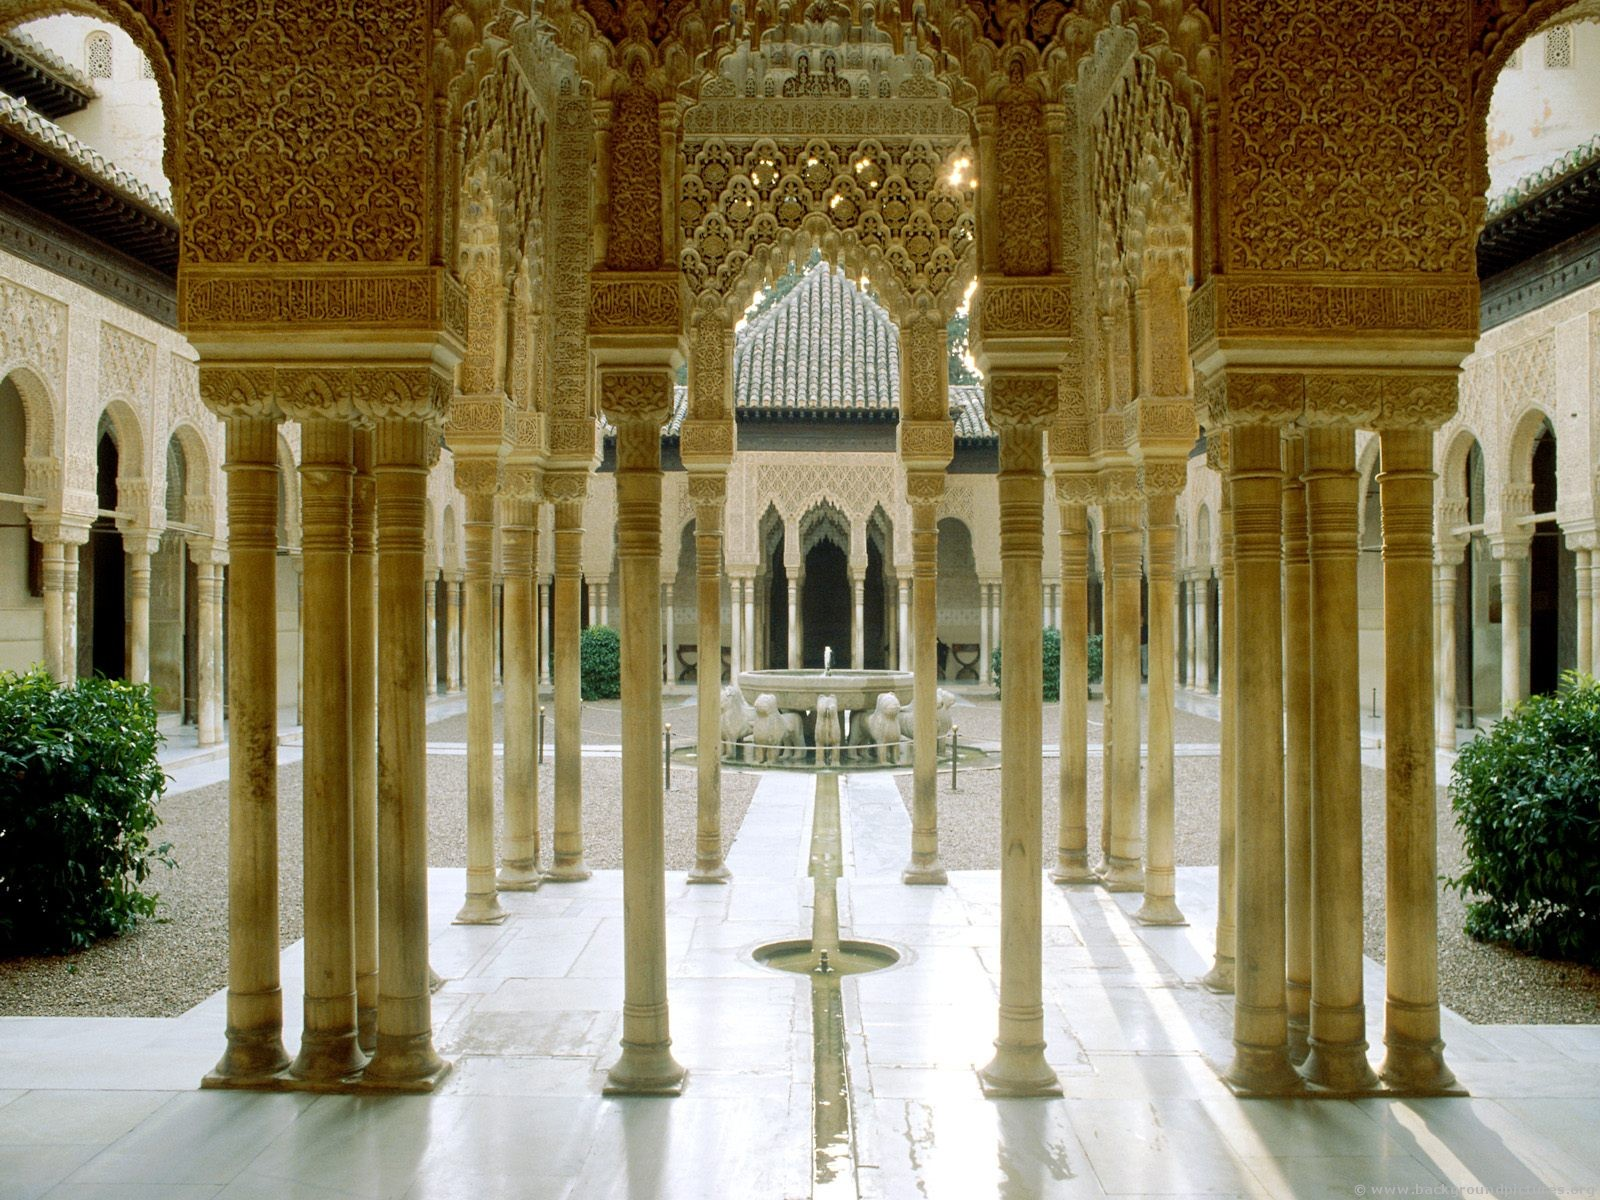 Внутренняя территория Альгамбры, Гранада